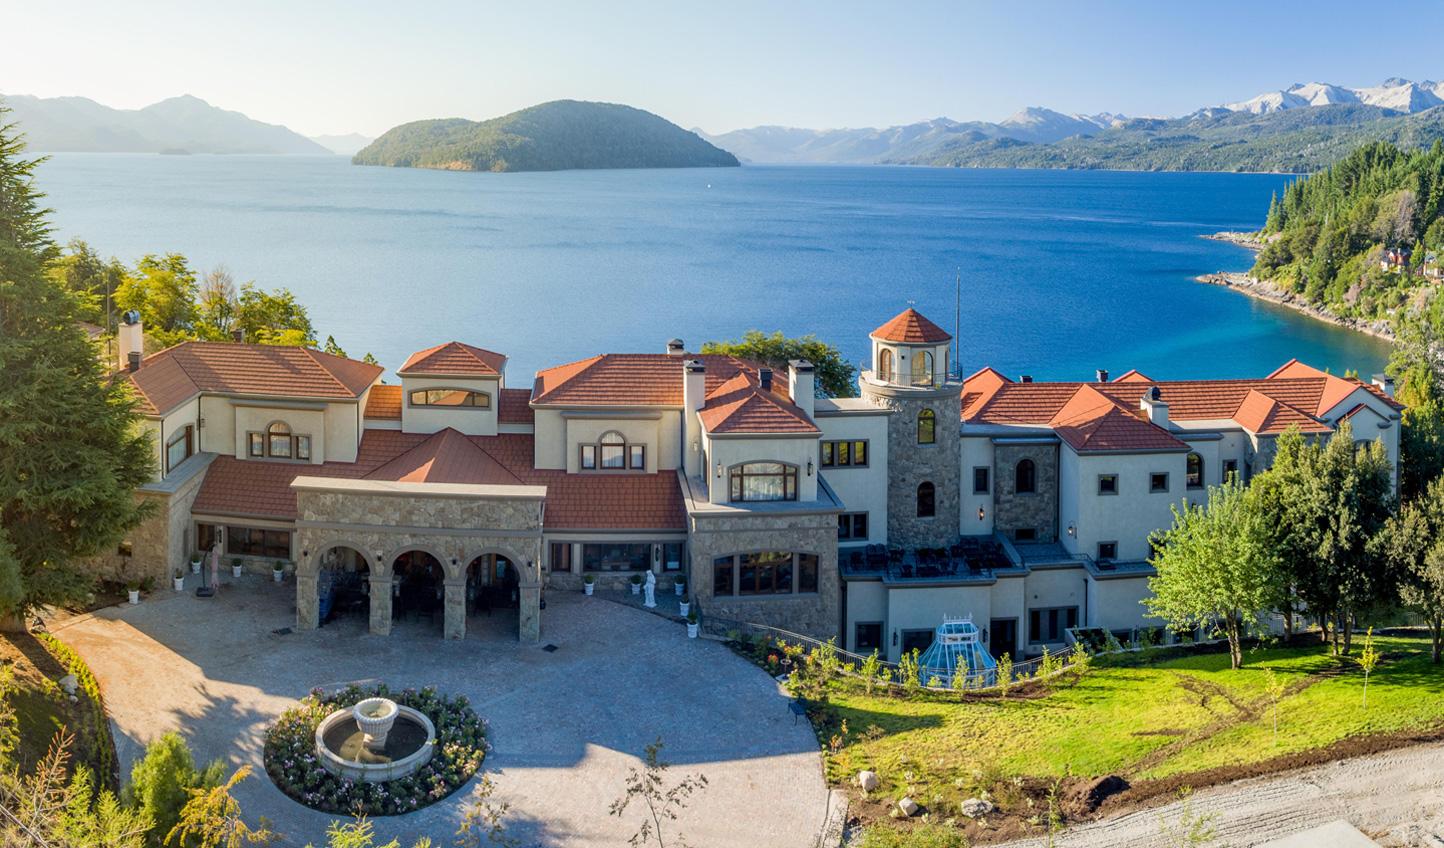 Villa Beluno, Bariloche   Luxury Hotels & Lodges in Argentina